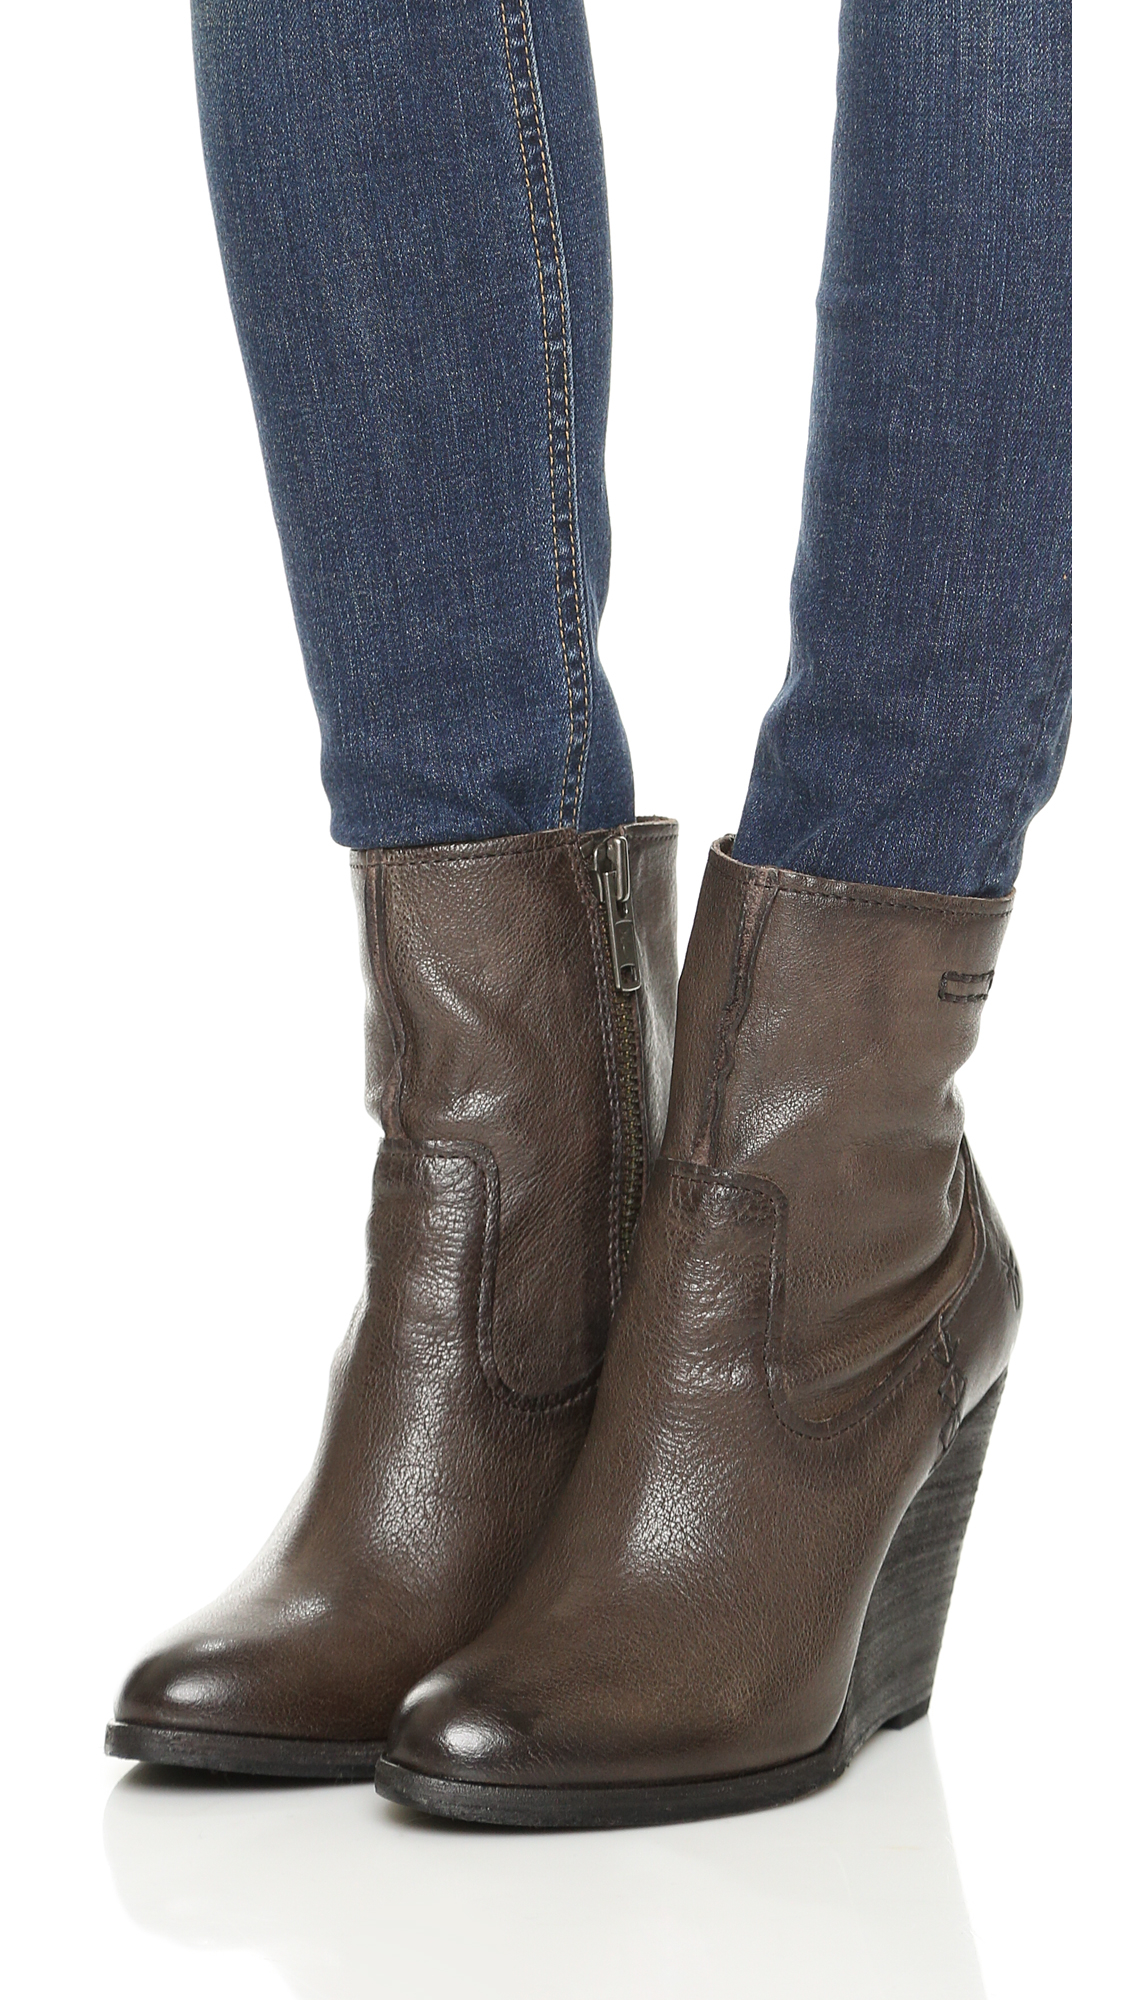 ebd8cae3569 Lyst - Frye Cece Artisan Short Wedge Booties in Gray